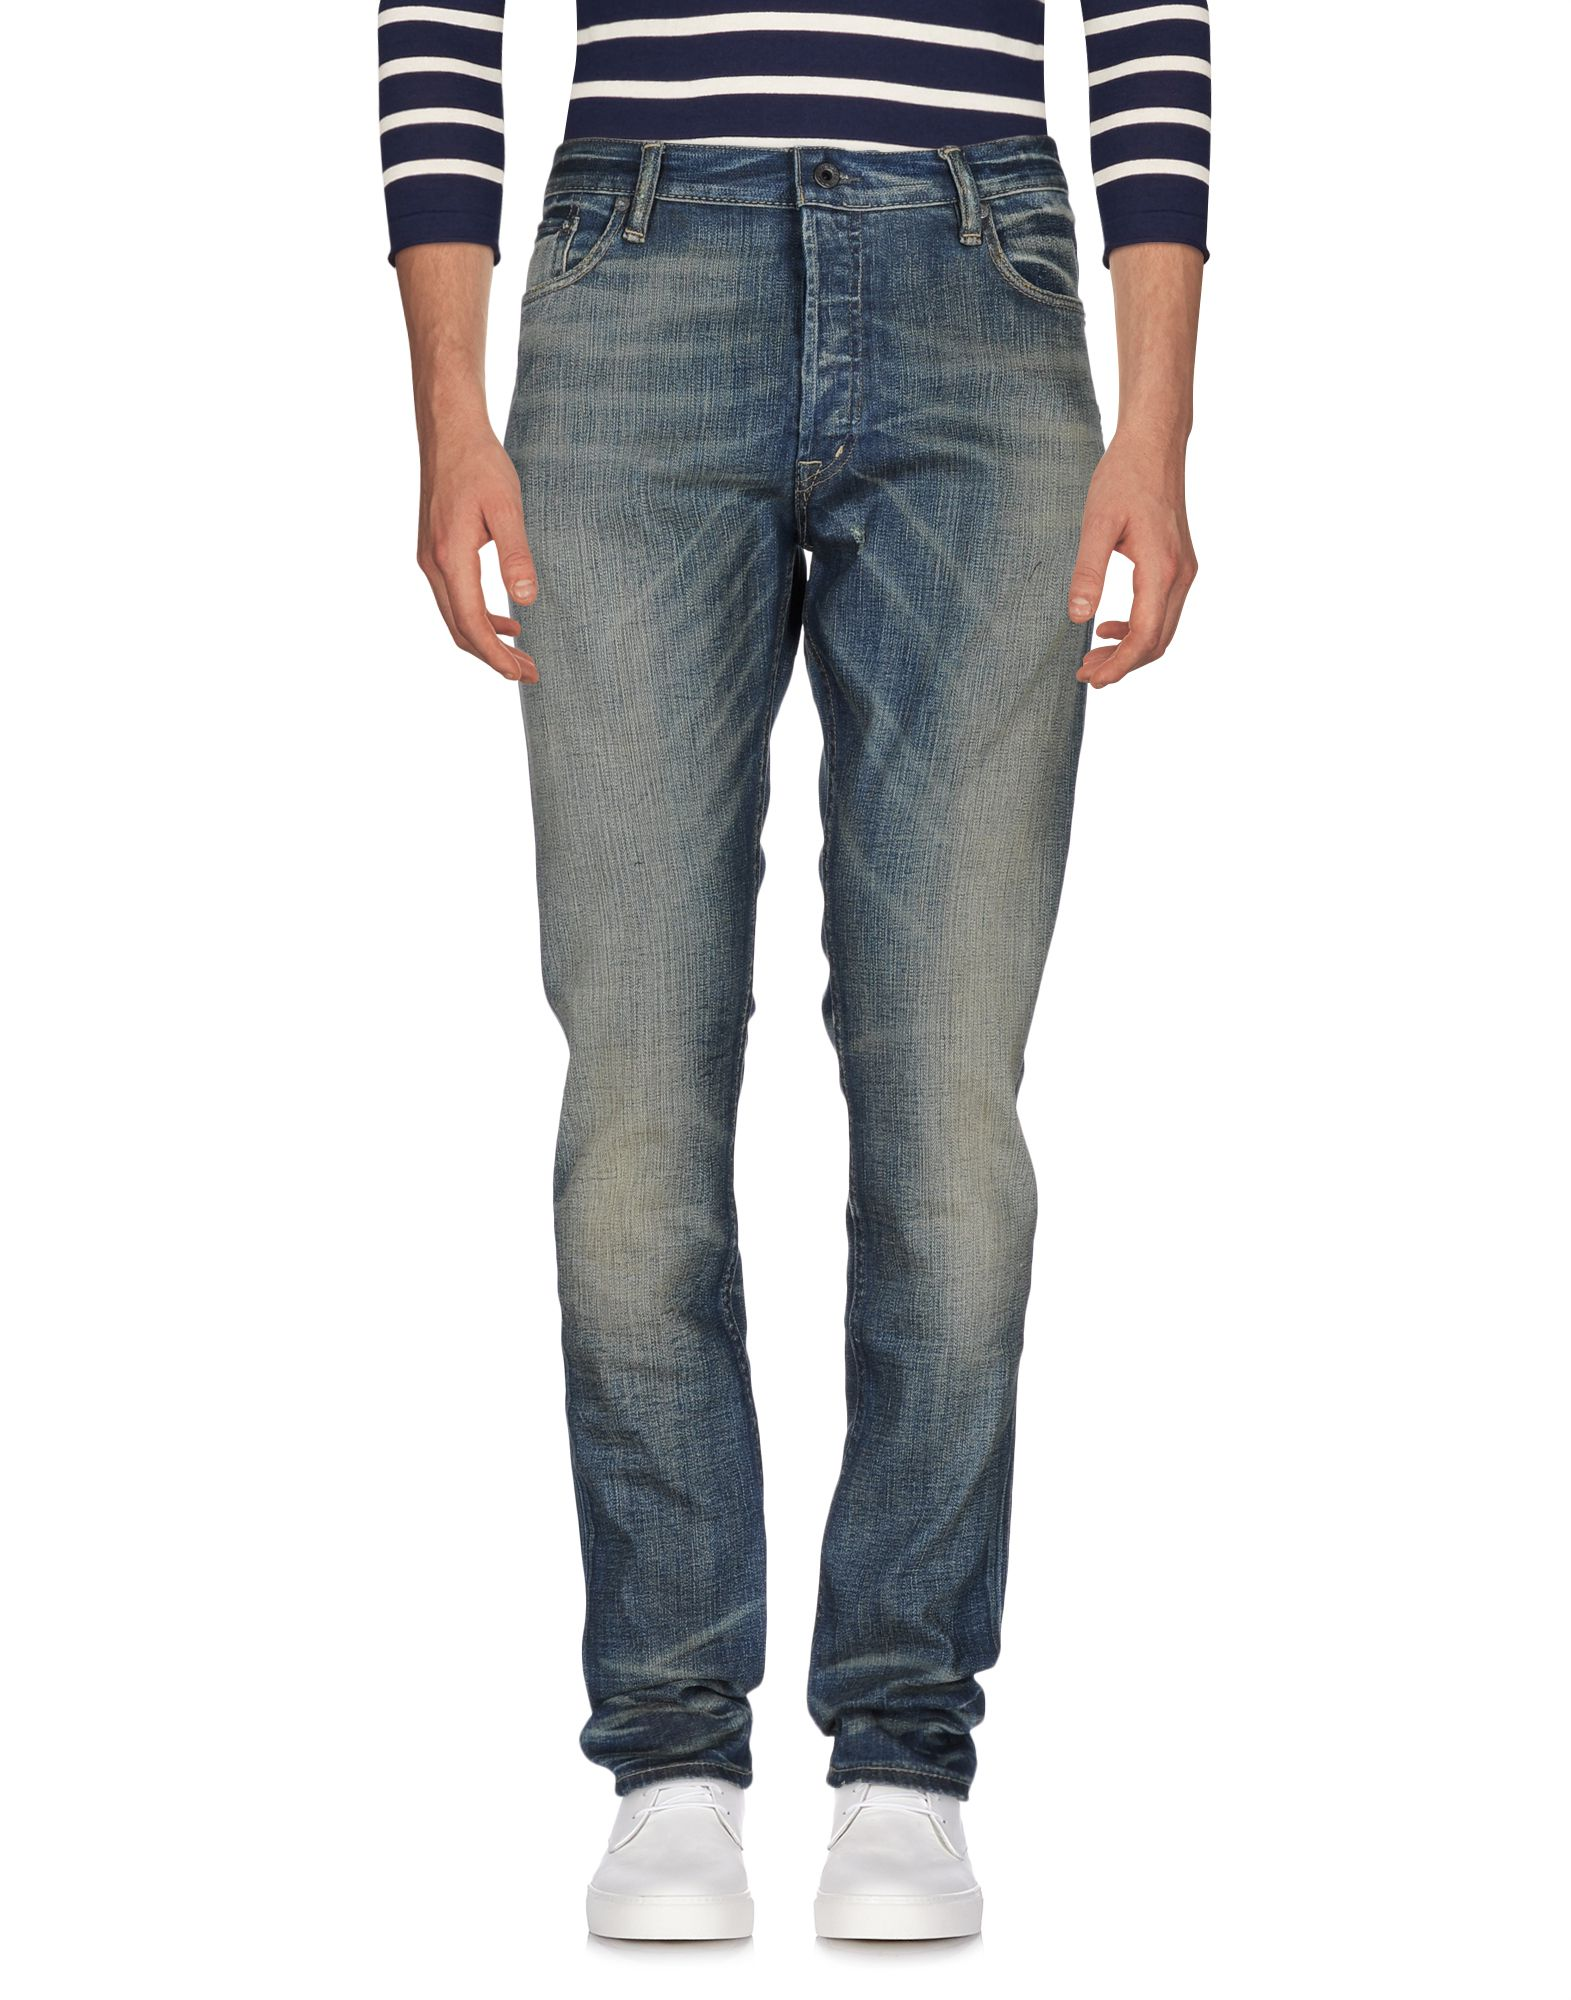 POLO JEANS COMPANY Джинсовые брюки polo jeans company джинсовые бермуды